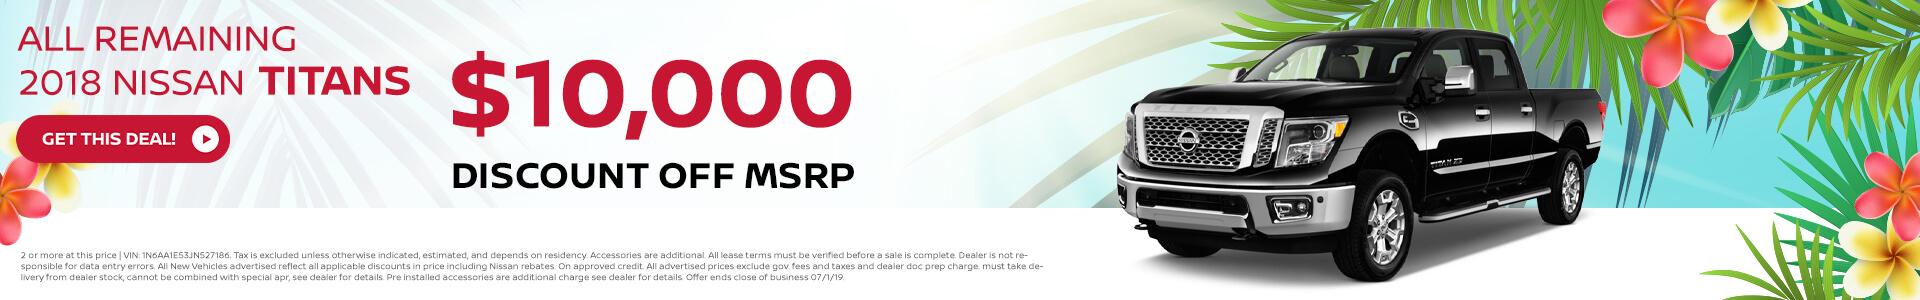 2018 Nissan Titan - $10,000 Off MSRP